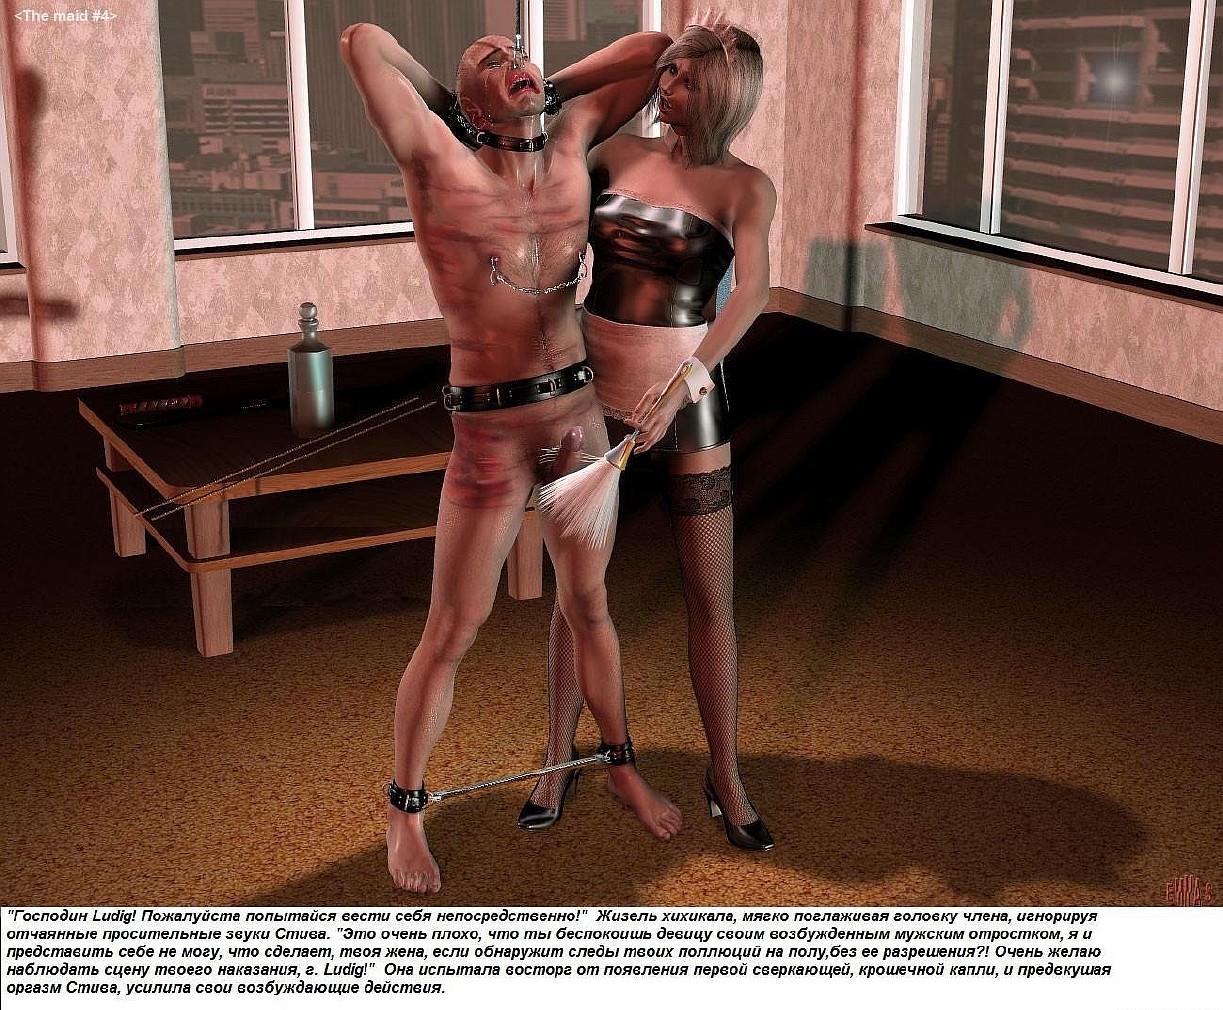 Foto porno komics bdsm art adult galleries